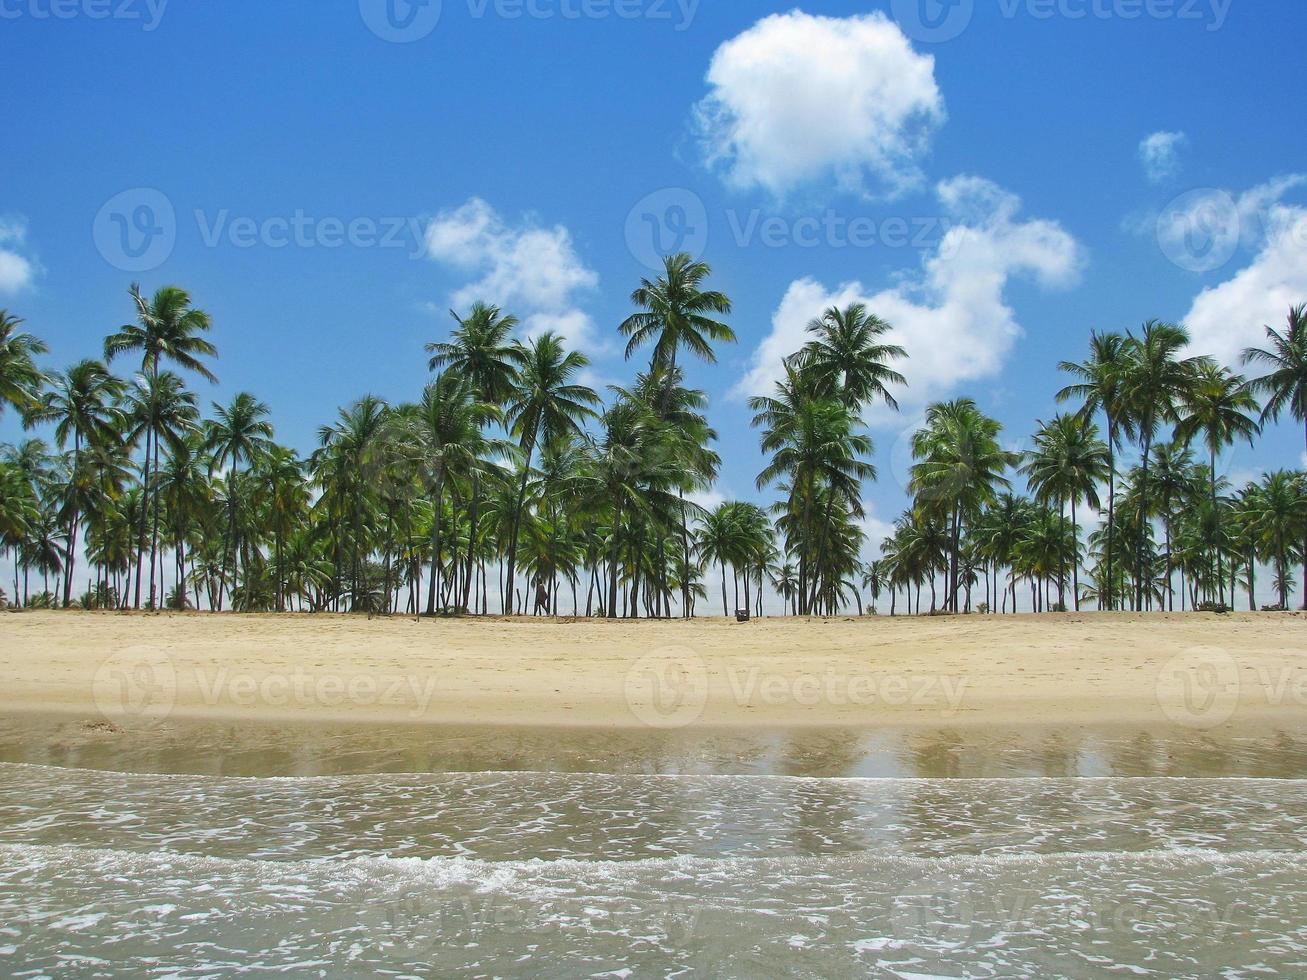 Porto de Galinhas, Brasilien: wunderschöner verträumter tropischer Strand. foto